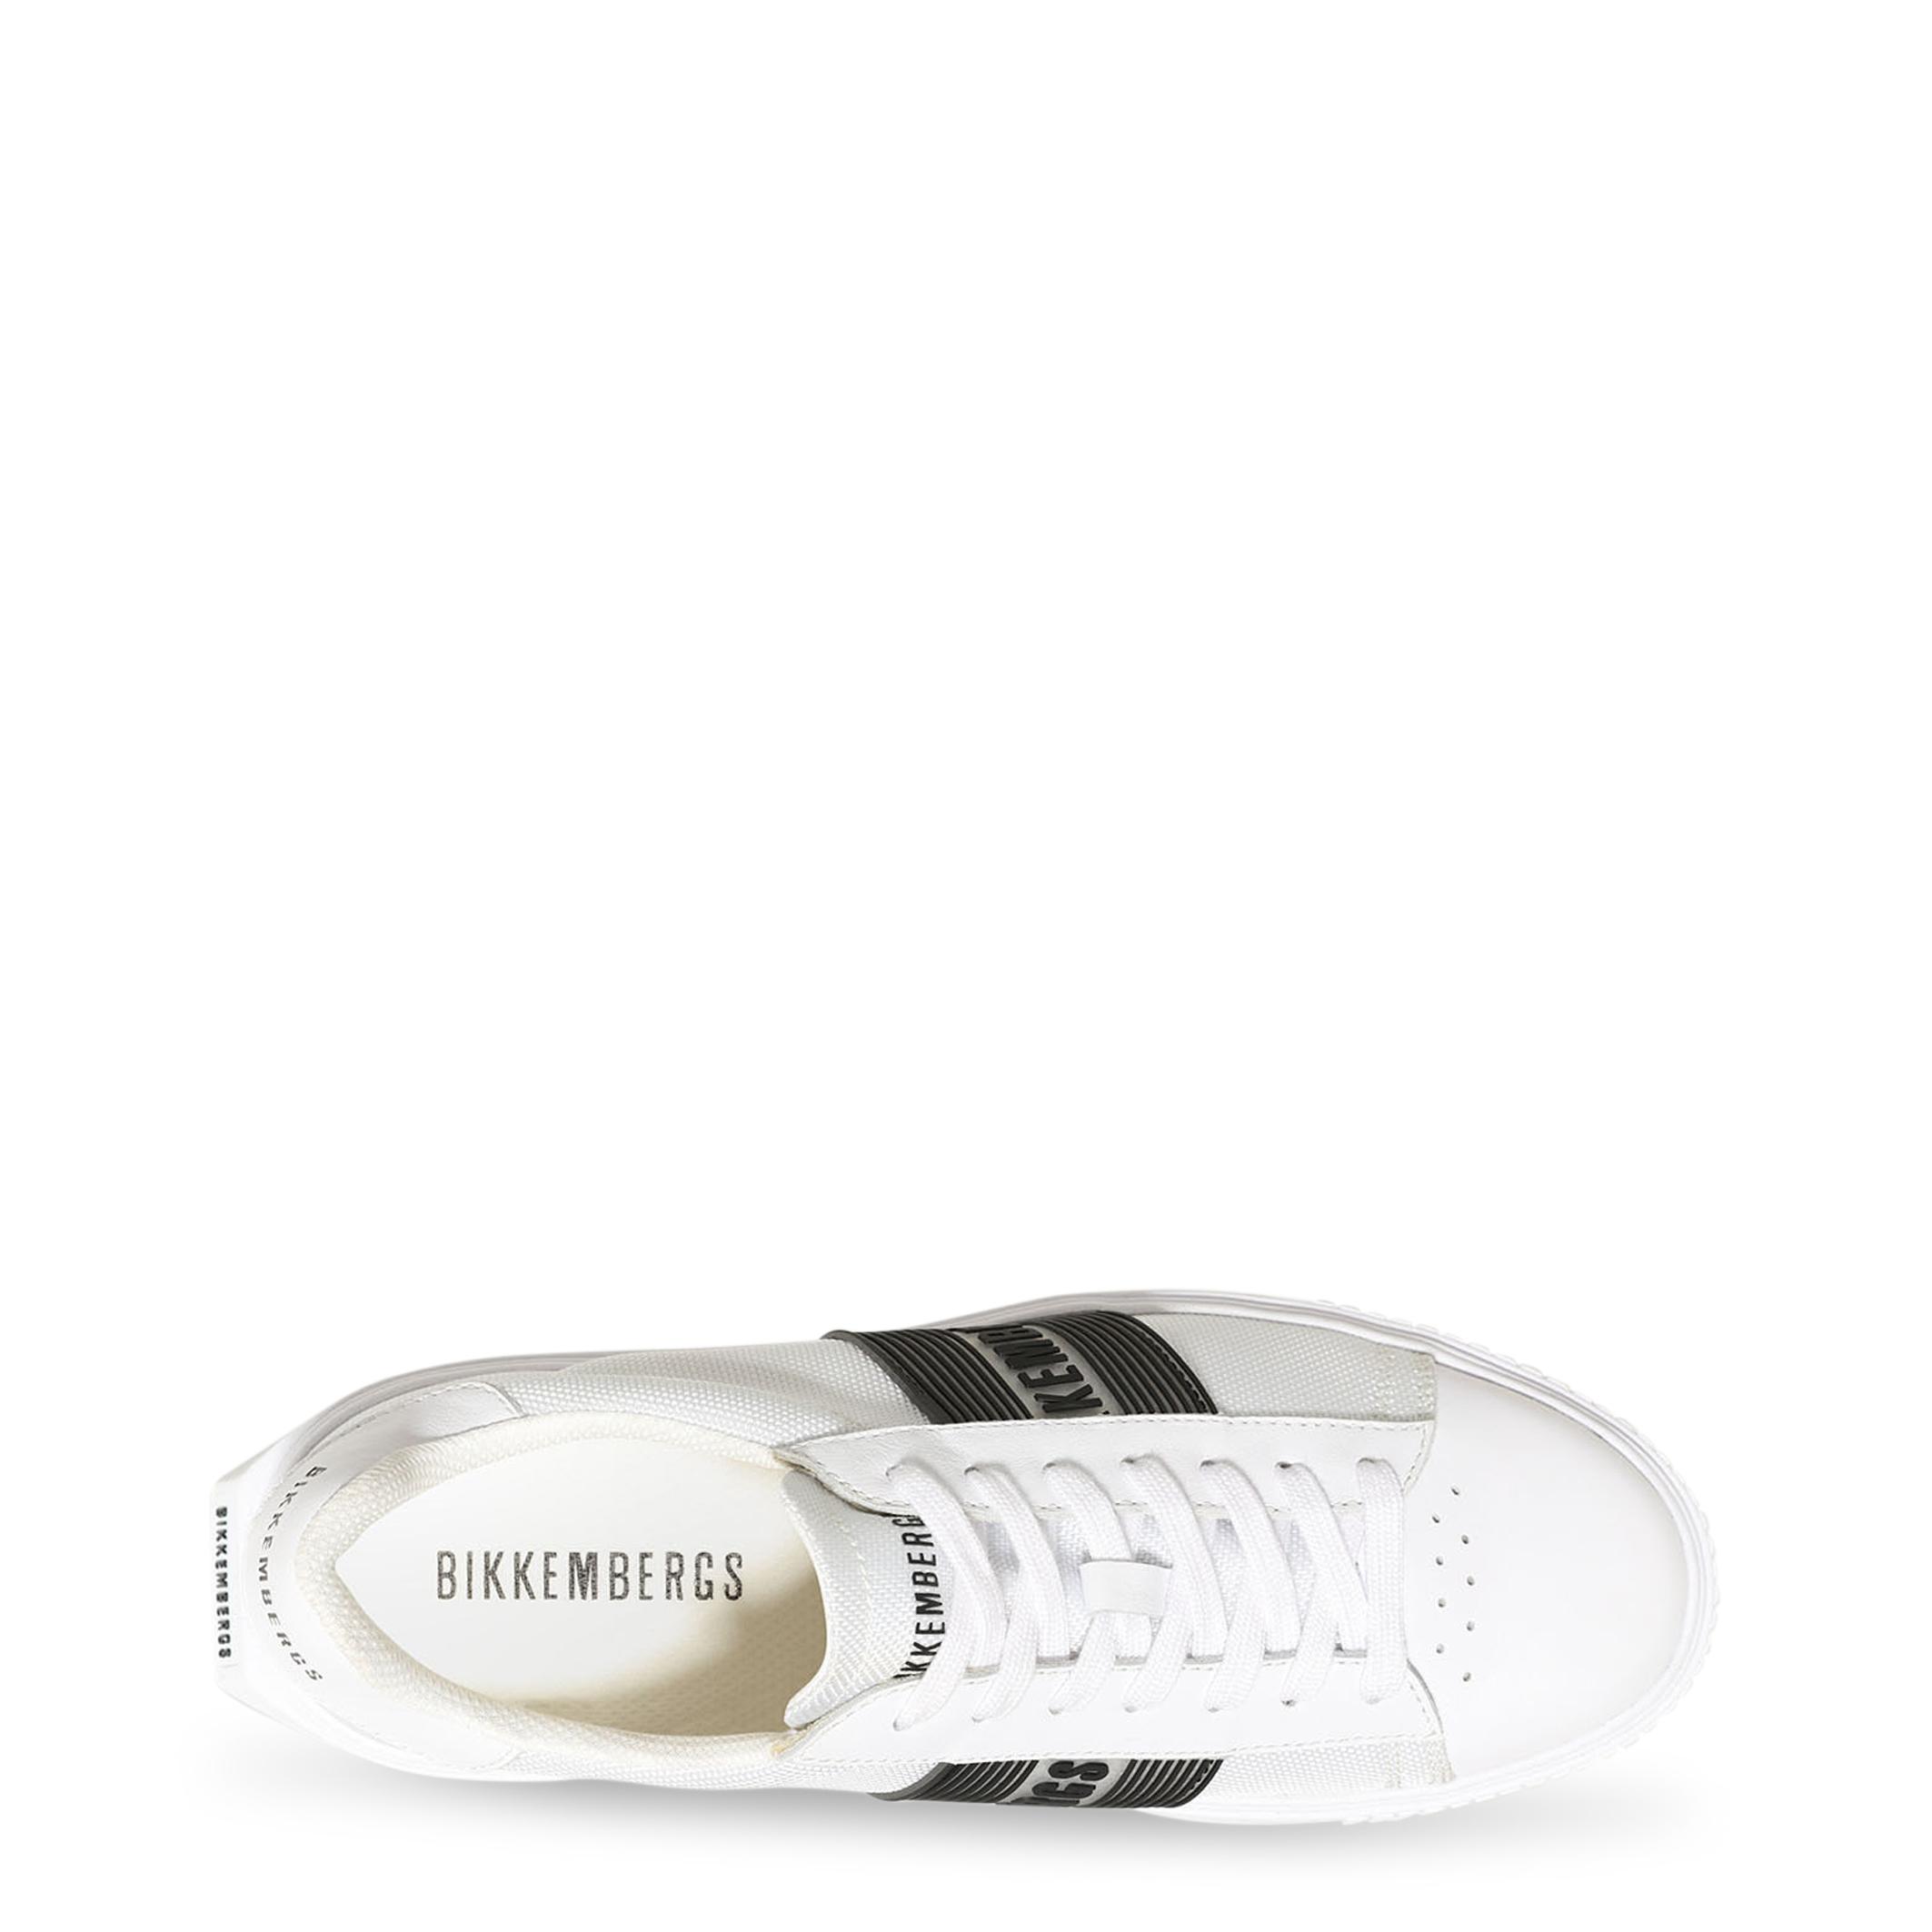 Baskets / Sport  Bikkembergs CESAN_B4BKM0027_100 white